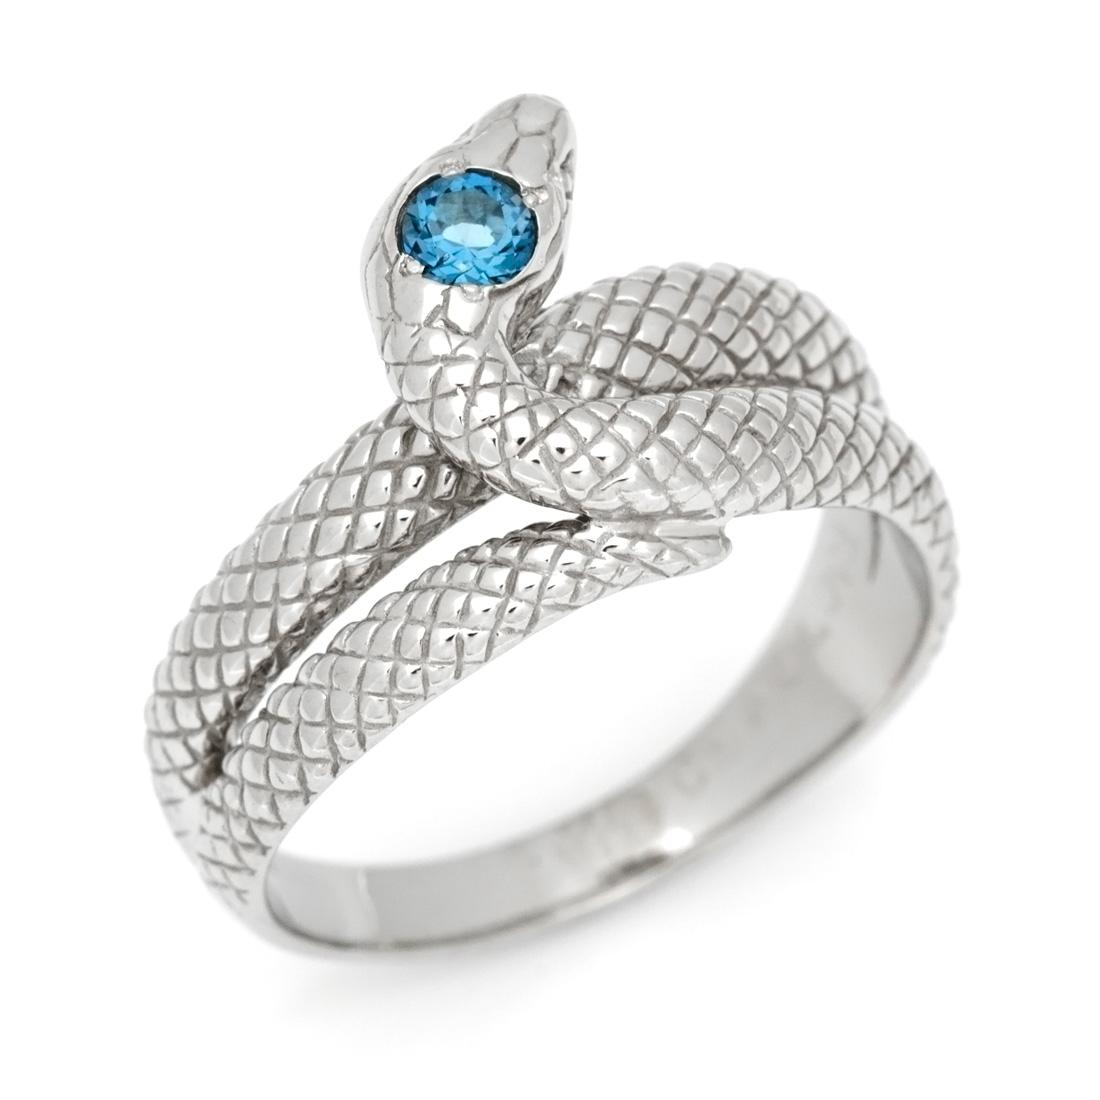 SV925 ロンドンブルートパーズ スネークモチーフ リング指輪 シルバー925 SILVER スターリングシルバー 蛇 誕生日 11月誕生石 刻印 文字入れ メッセージ ギフト 贈り物 ピンキーリング対応可能